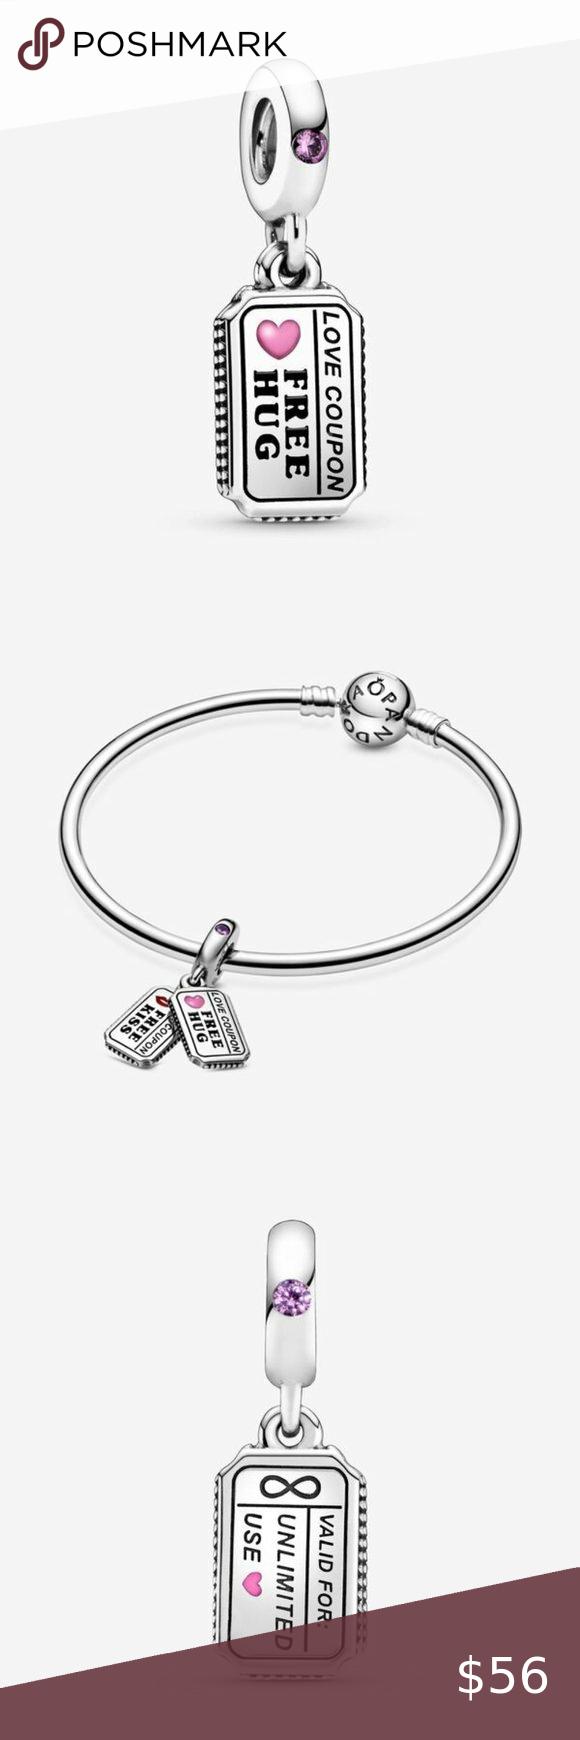 Pandora Love Coupon Dangle Charm In 2020 Love Coupons Dangle Charms Pandora Jewelry Bracelets